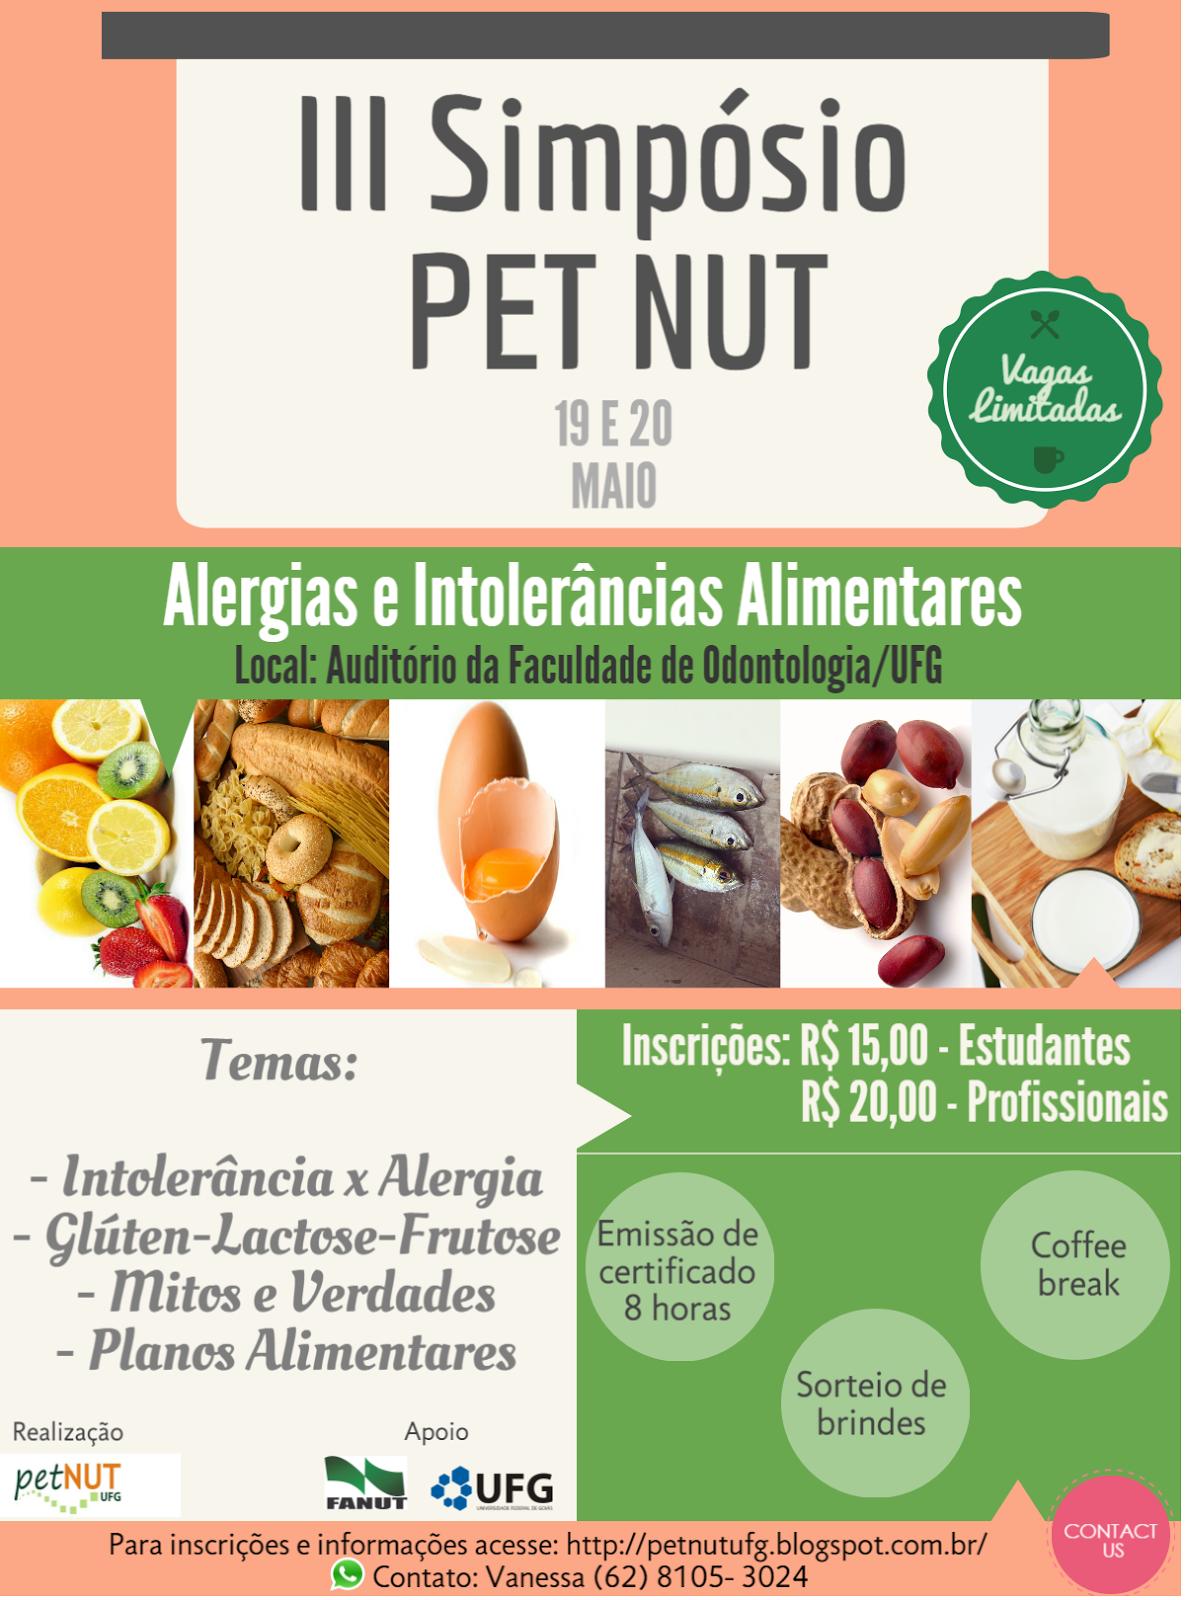 III Simpósio PET NUT: Alergias e Intolerâncias Alimentares